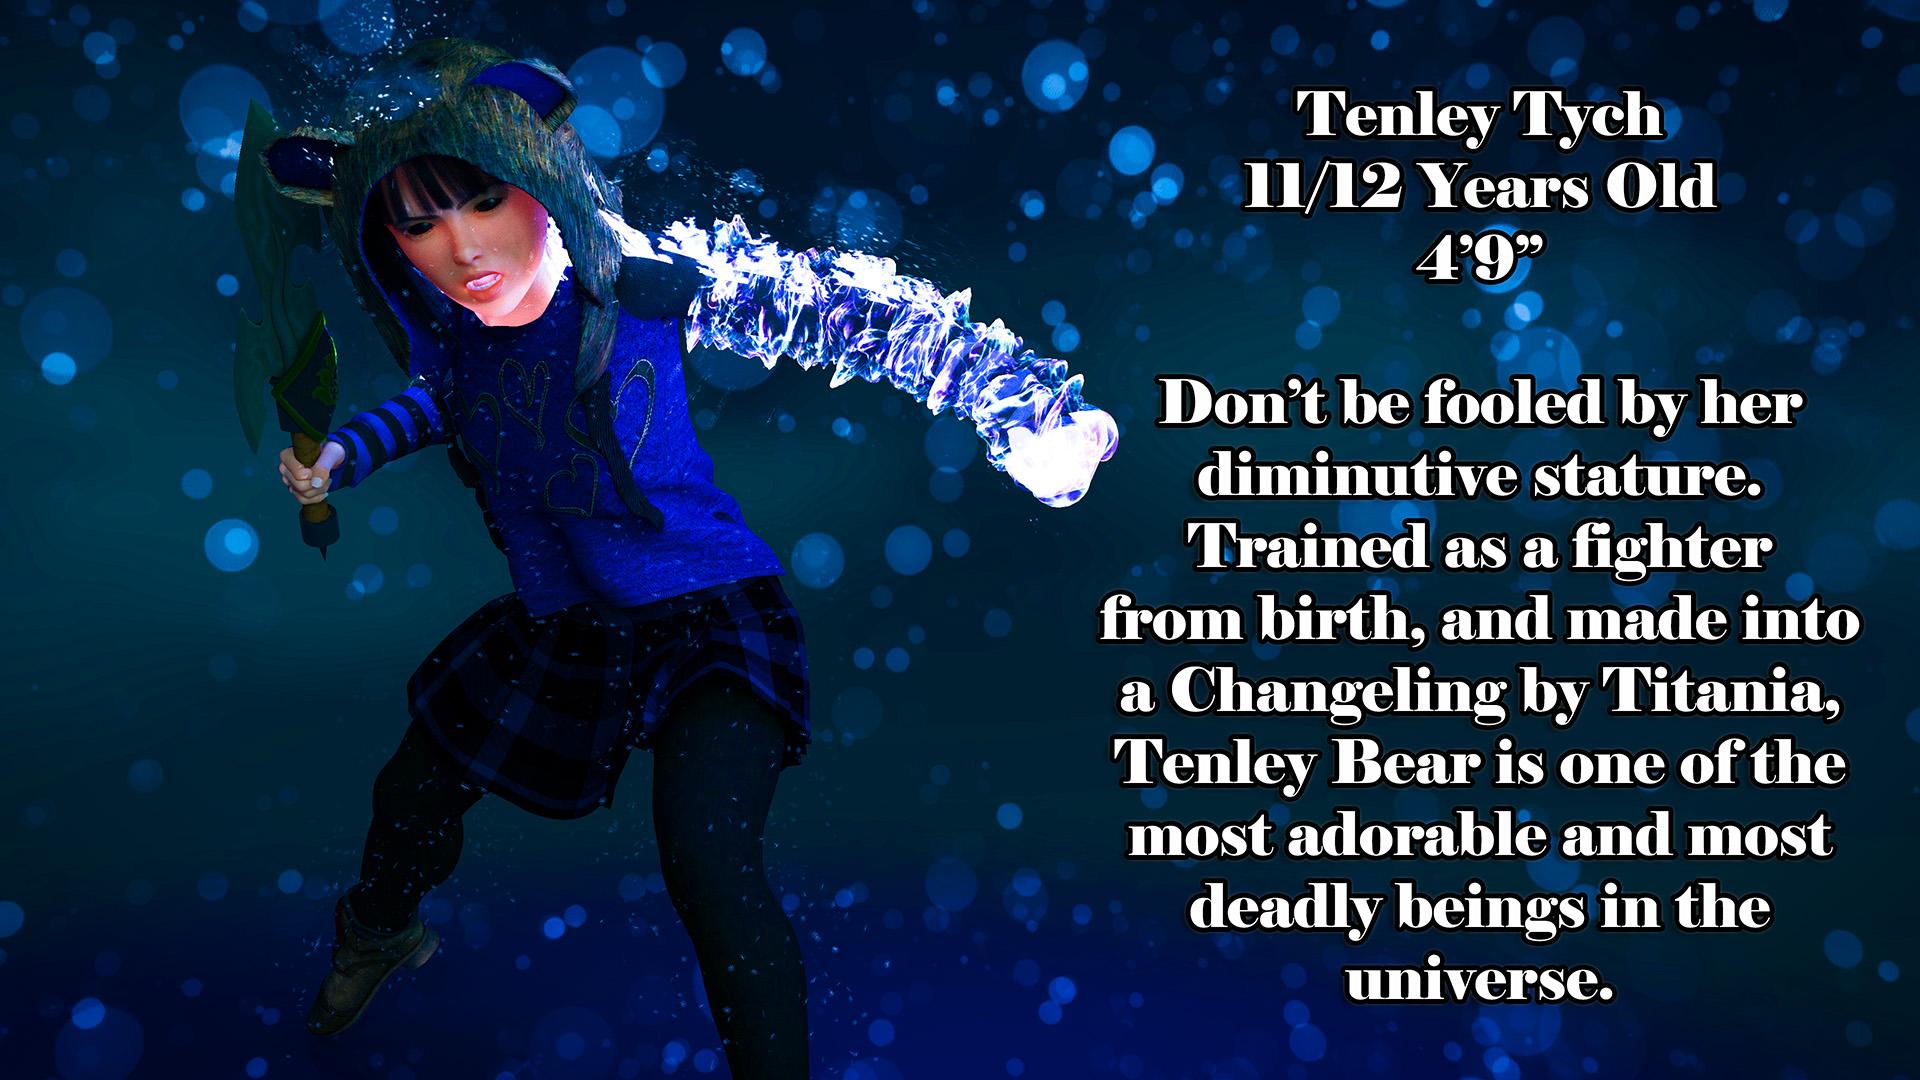 Tenley Tych